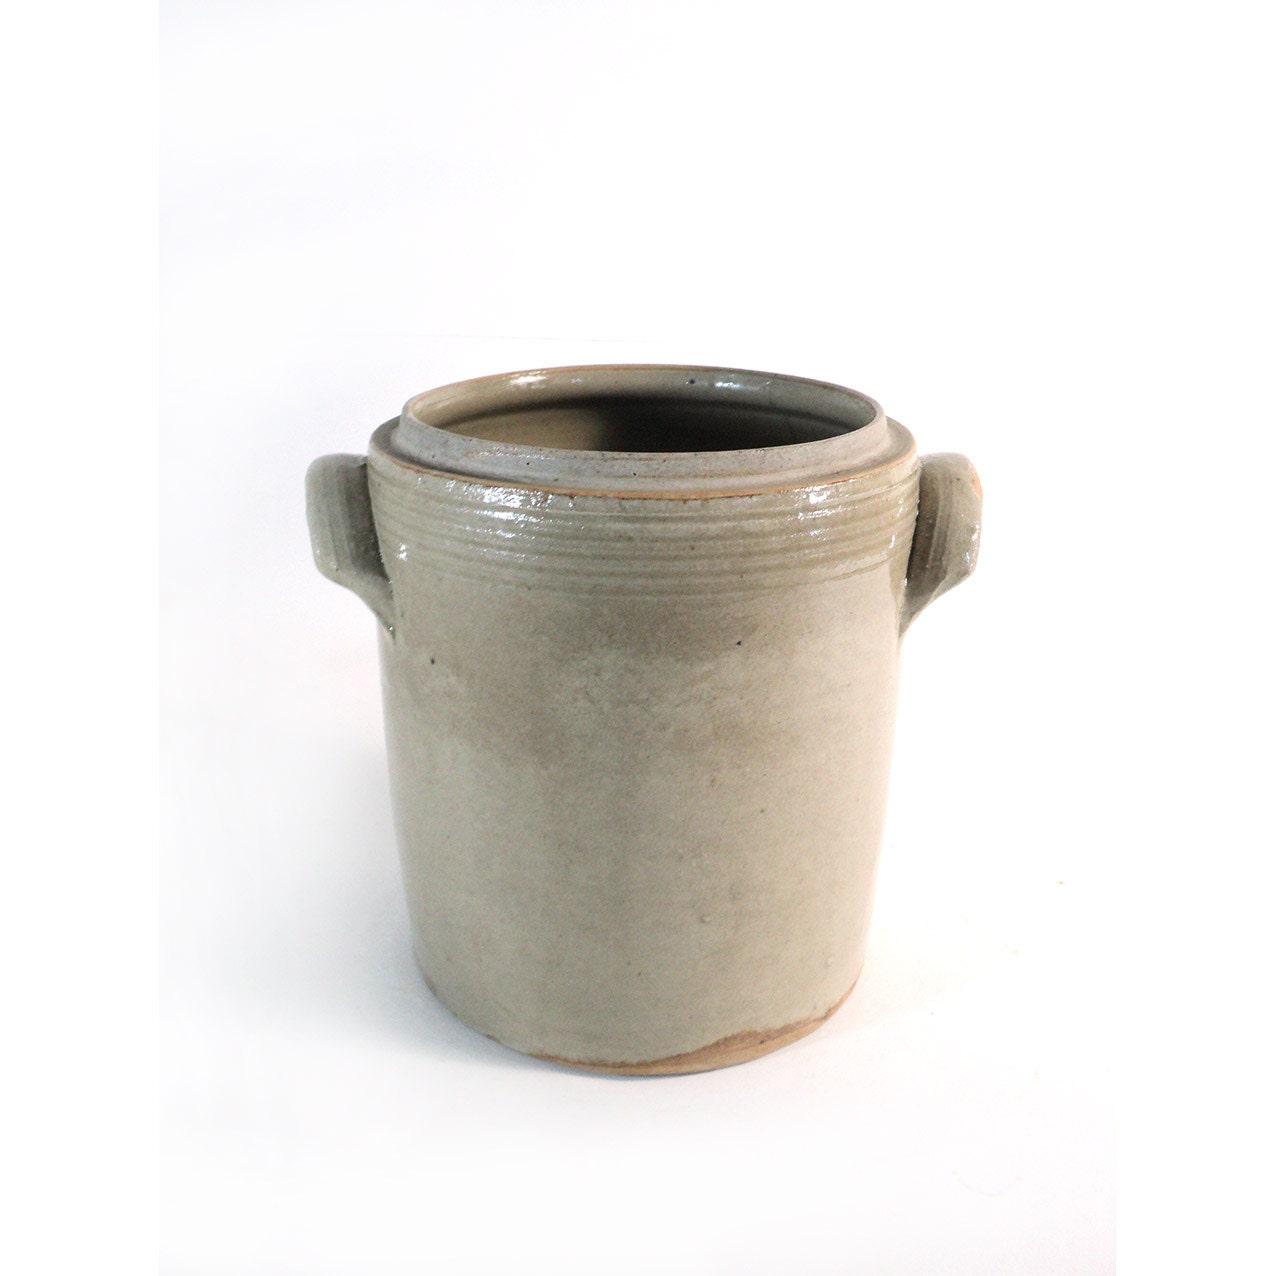 pot en gr s maill gris grand pot gris pot normand. Black Bedroom Furniture Sets. Home Design Ideas